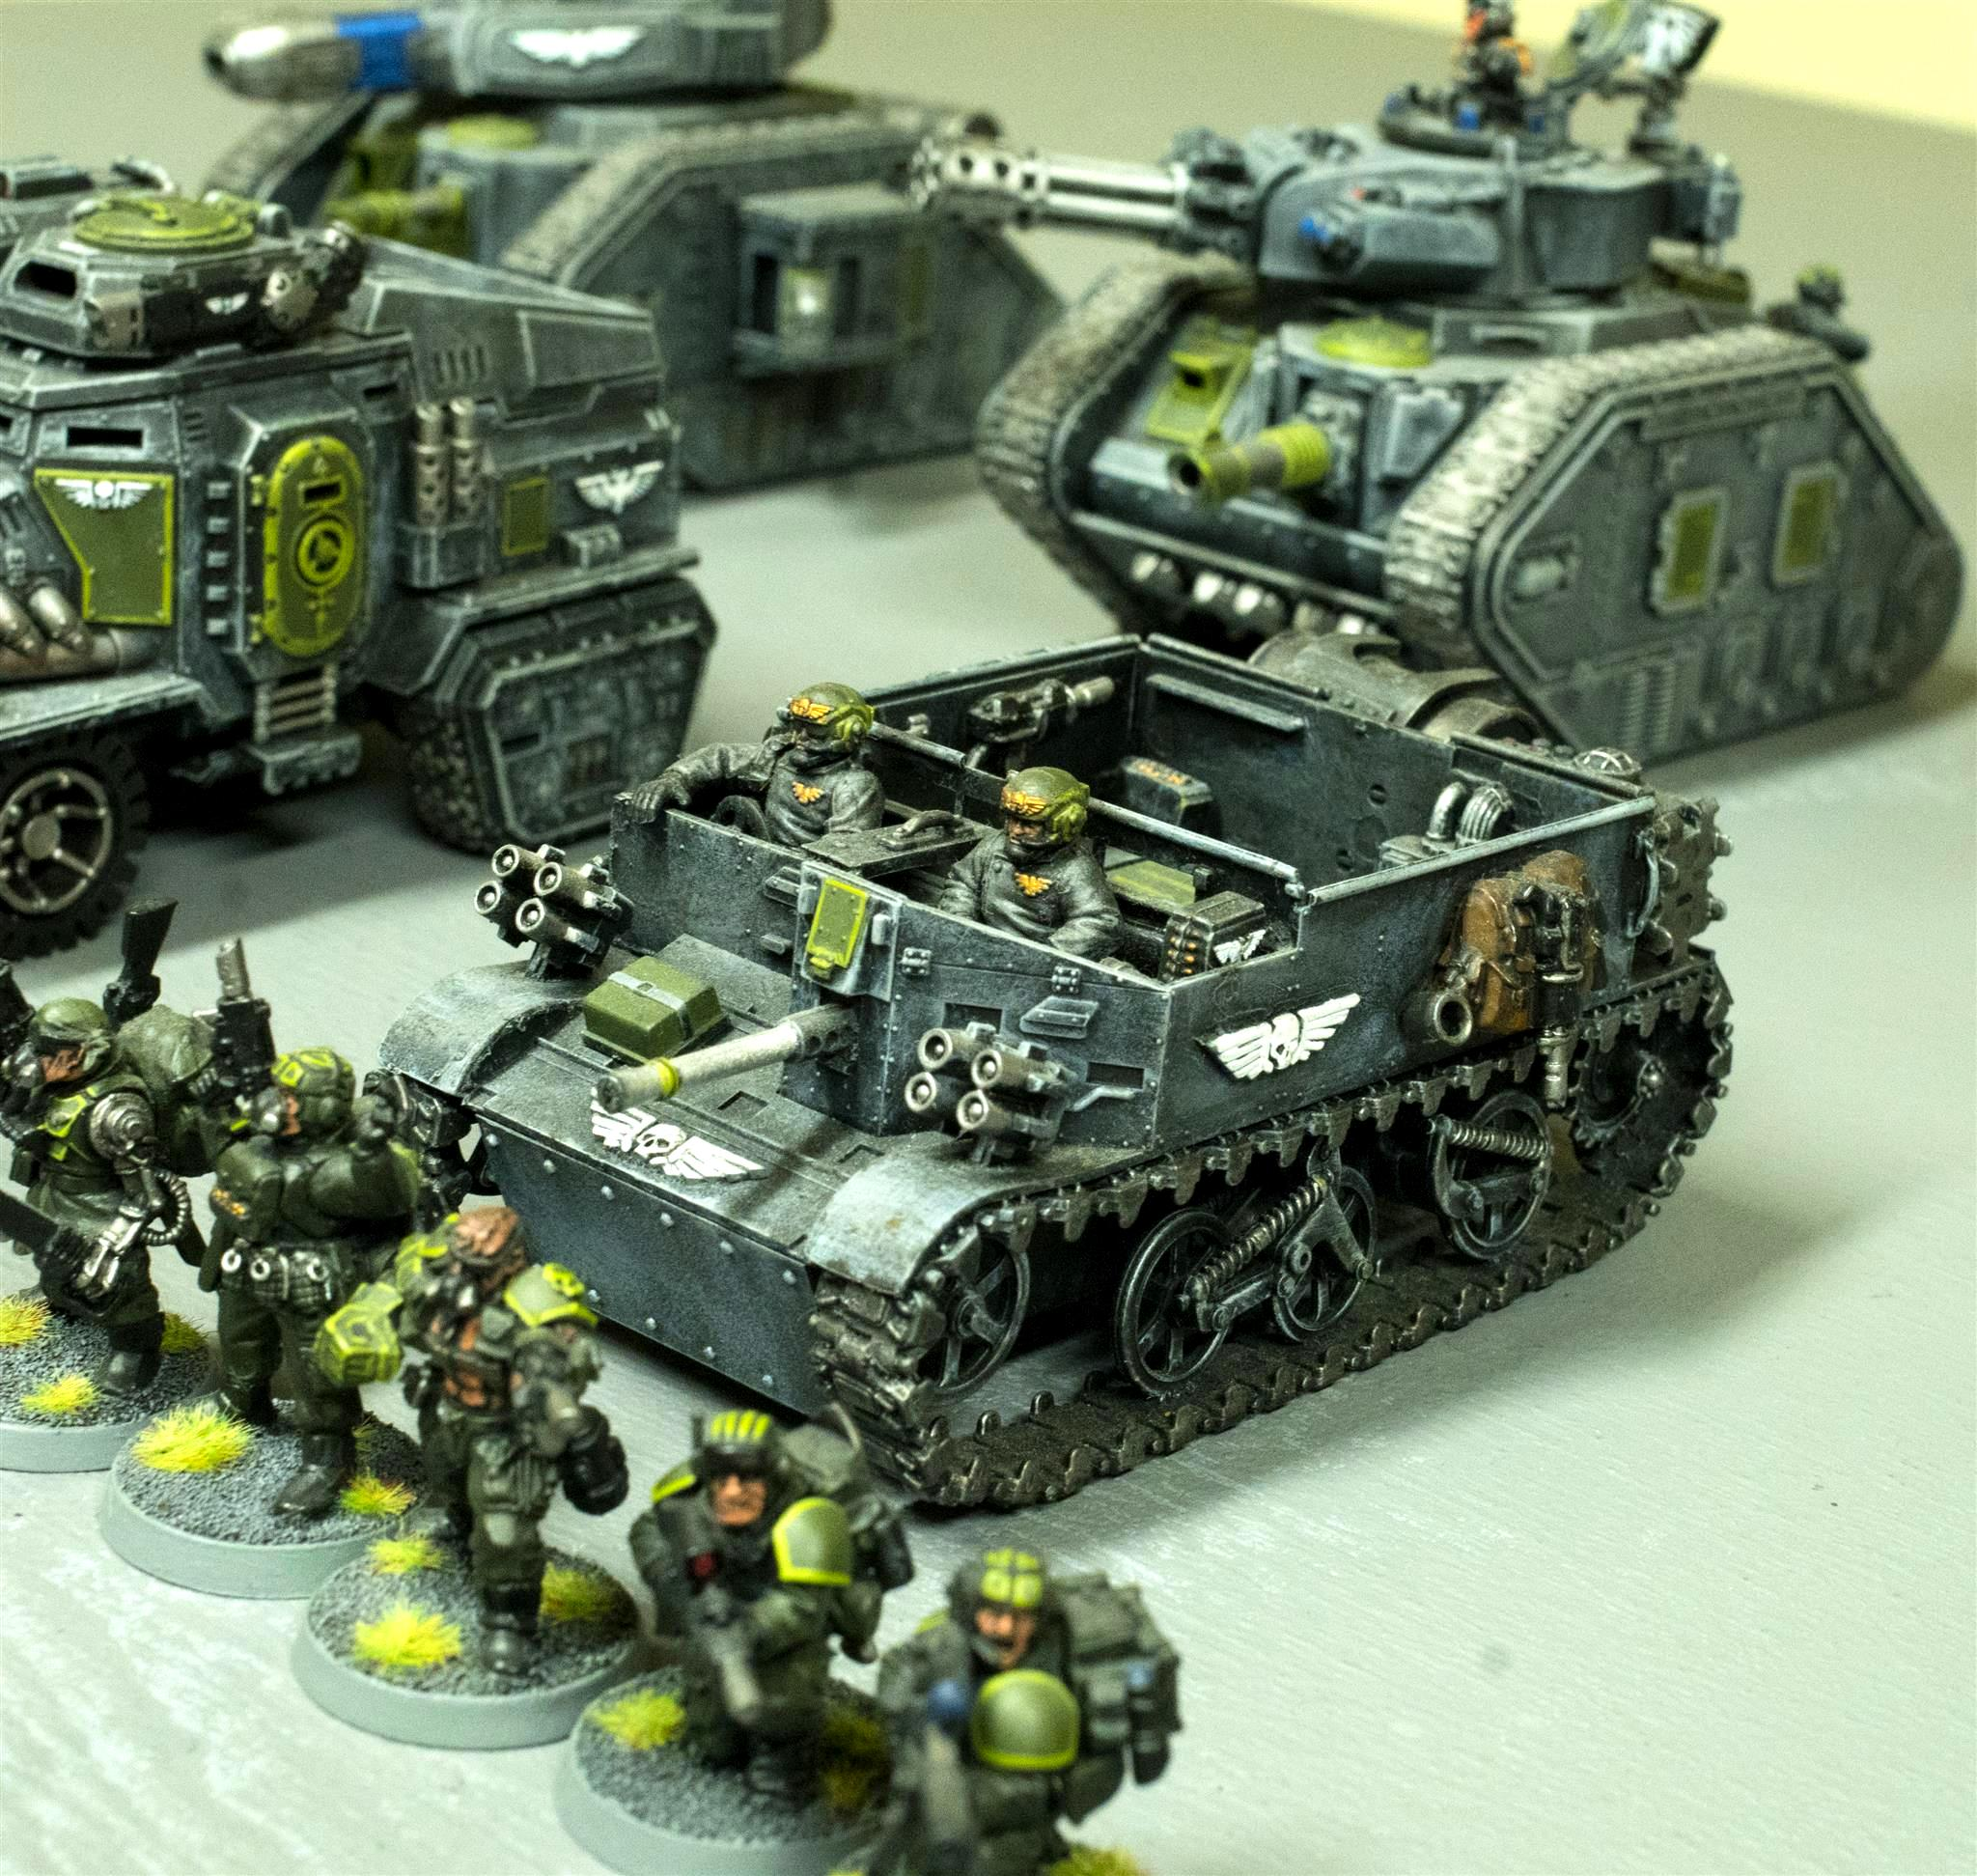 317th Sathanas Hoplites, Astra Militarum, Bren Gun Carrier, Centaur, Centaur Conversion, Count As Centaur, Guard, Imp Guard, Imperial Guard, Transport